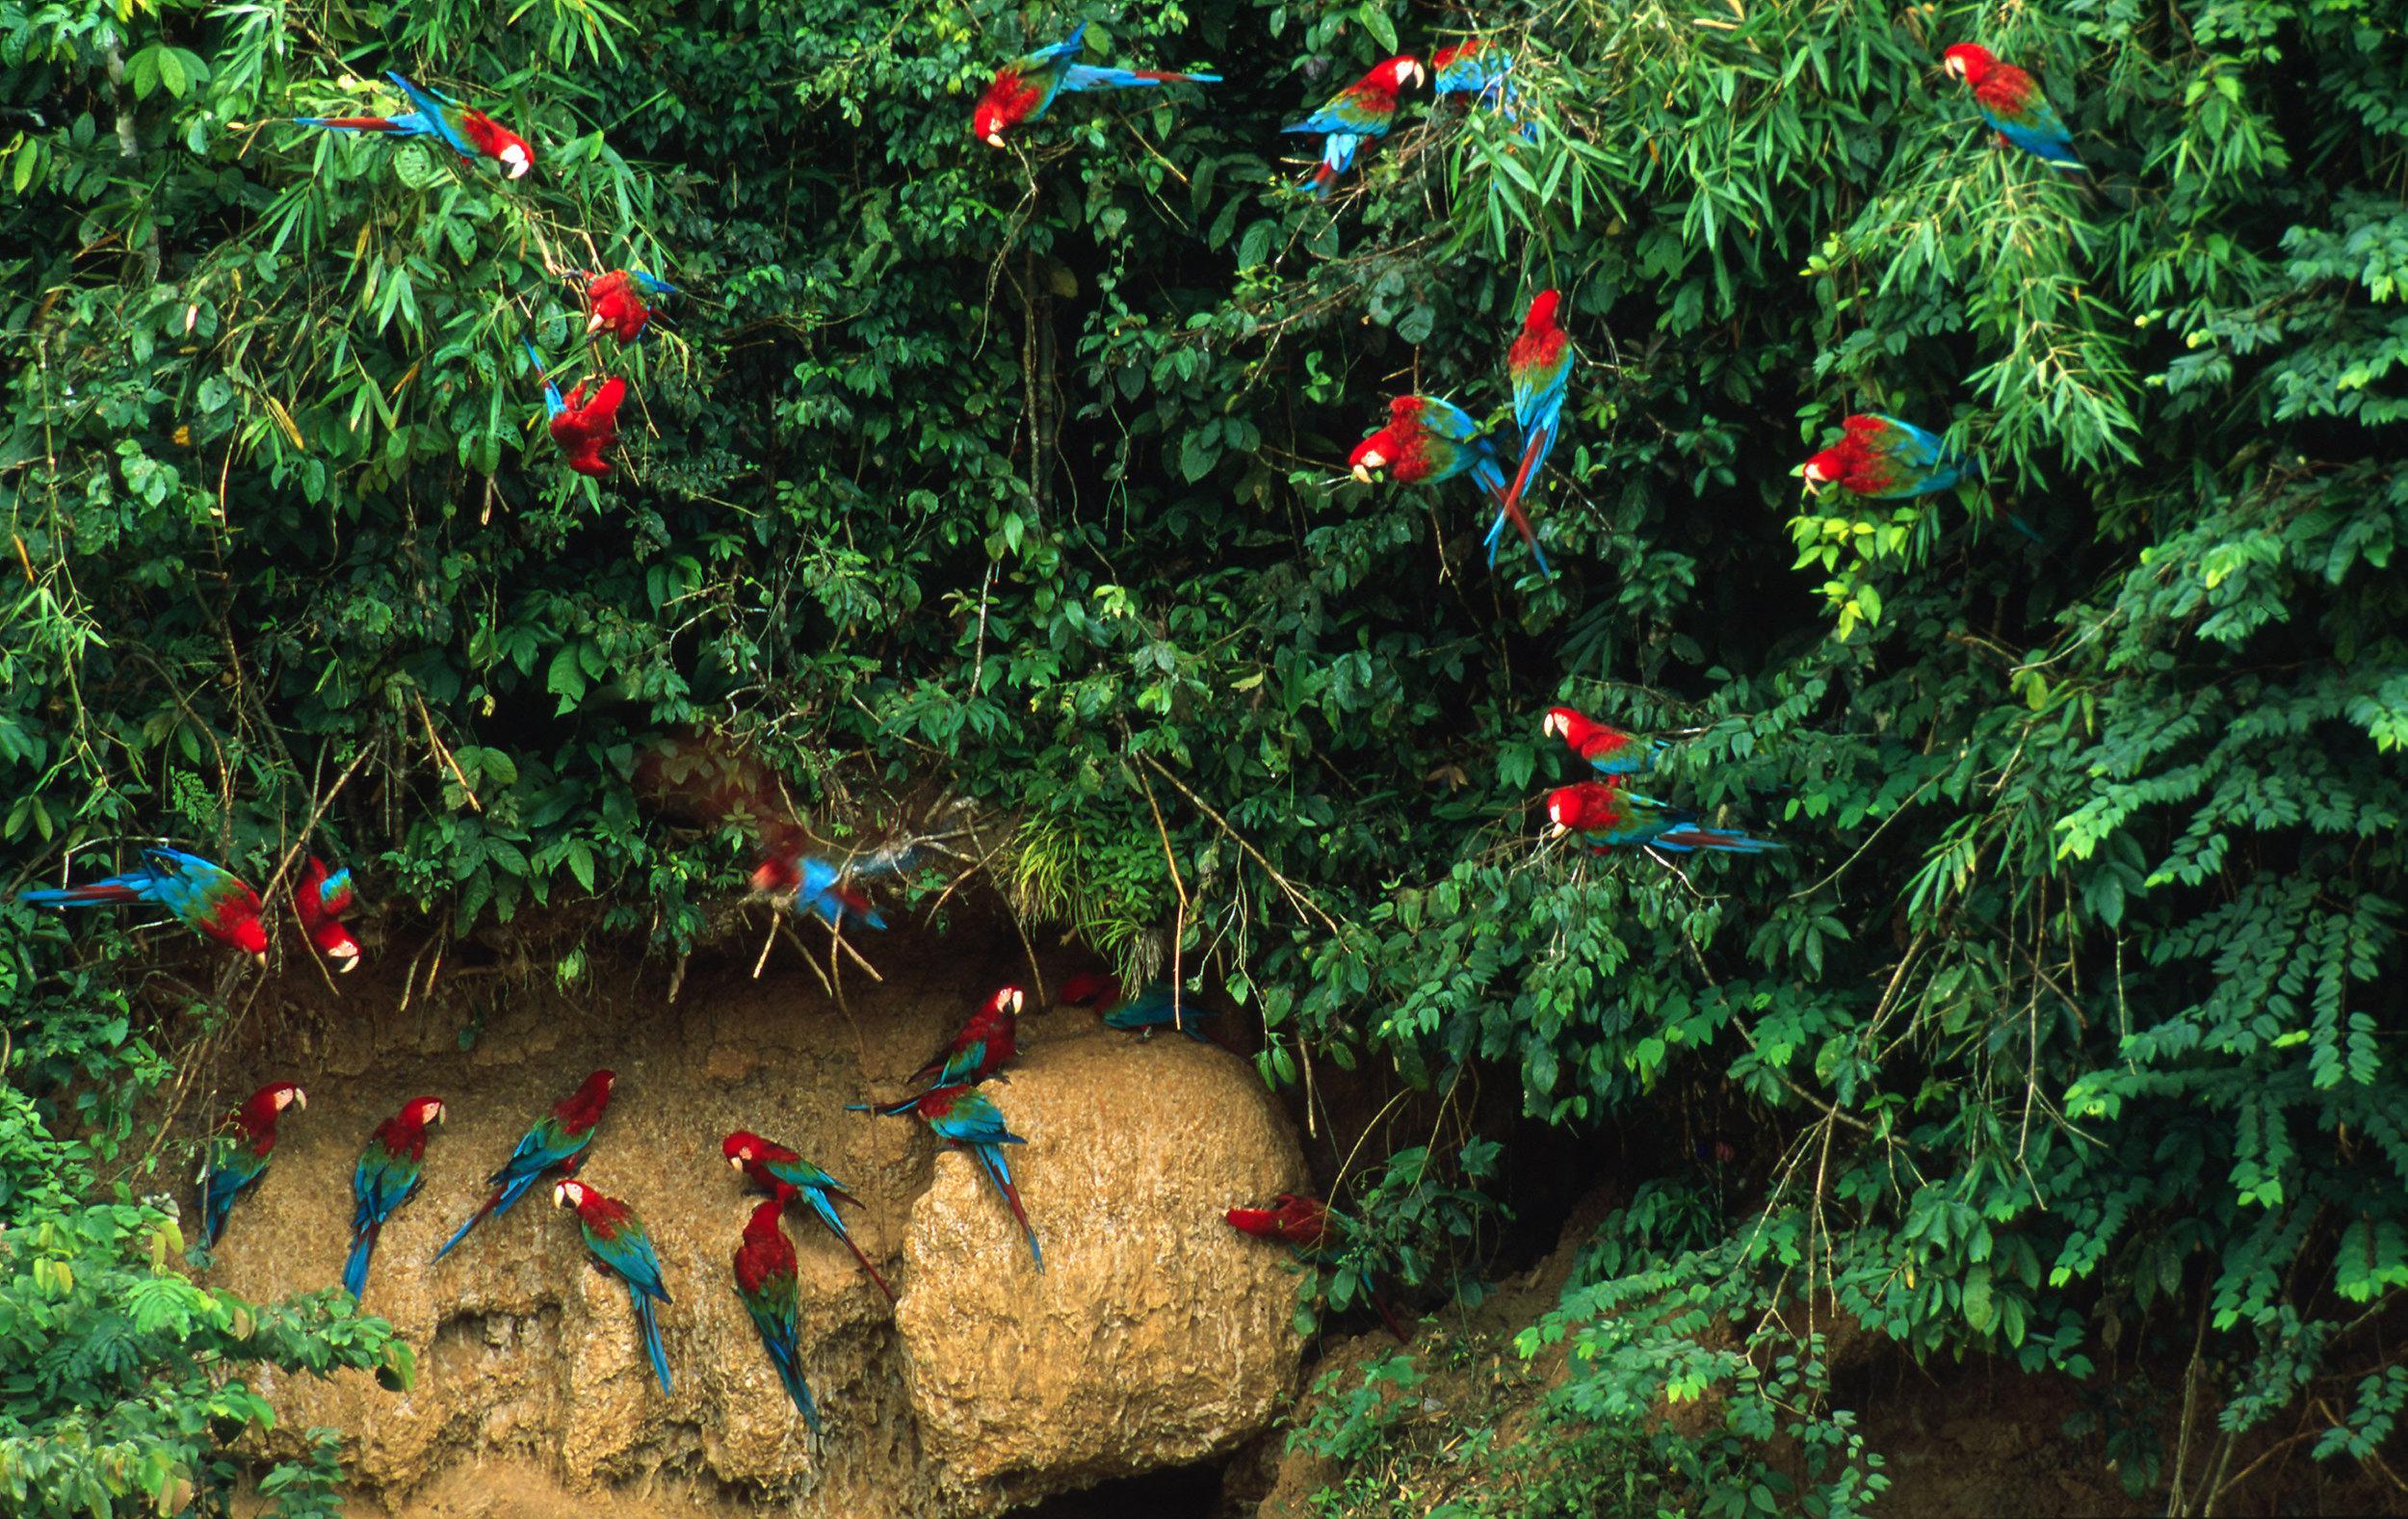 Biodiversity in Peru's Amazon.